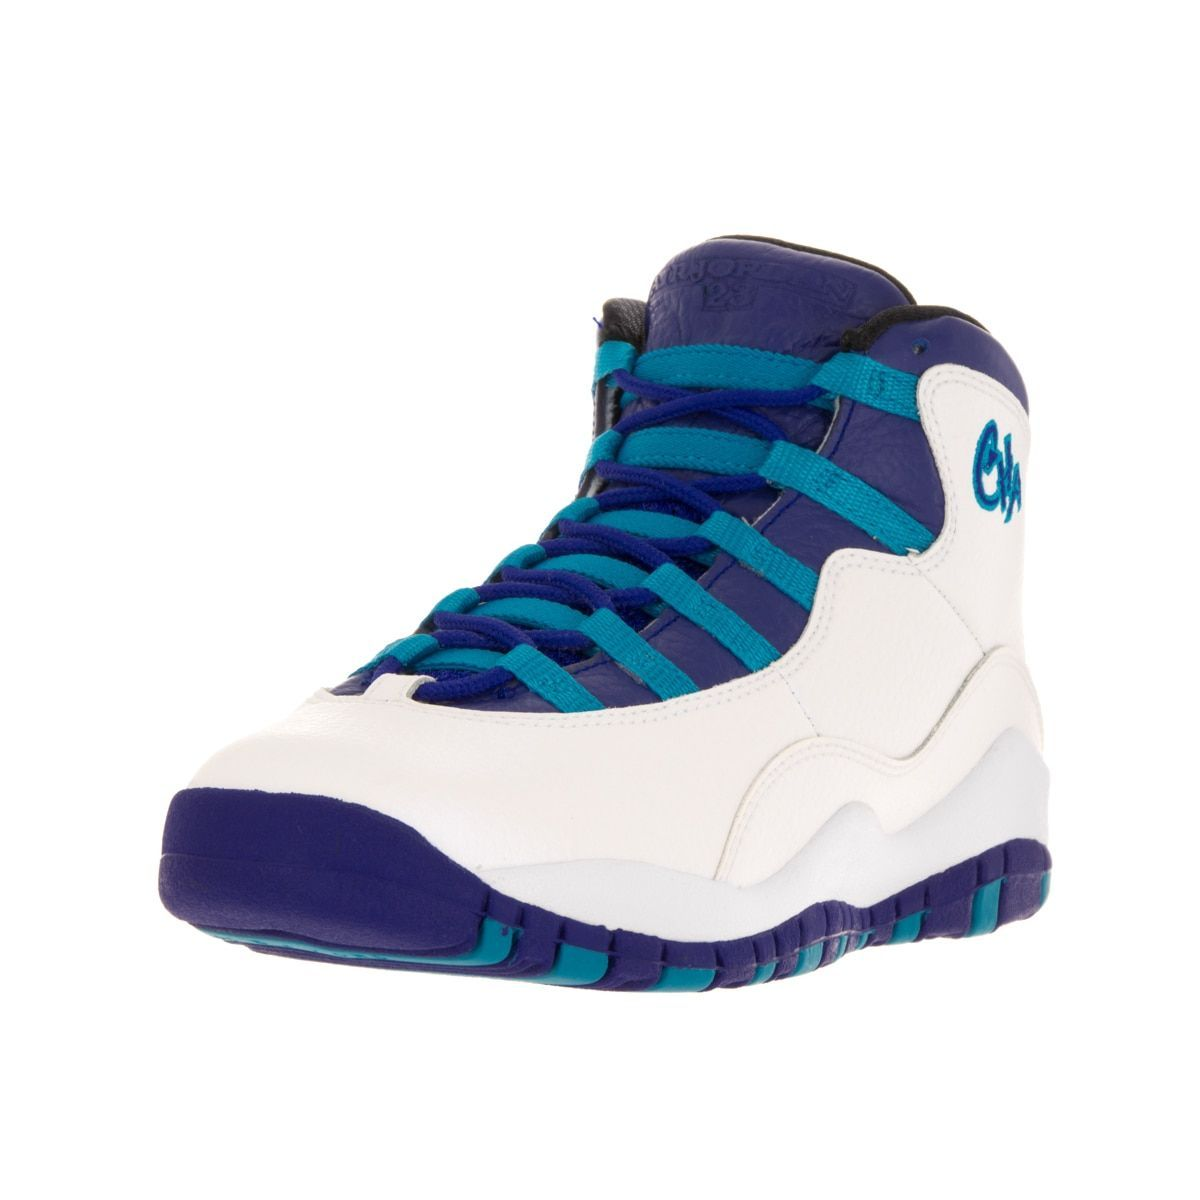 the latest 9d73c 8d720 Nike Jordan Kids Air Jordan 10 Retro Bg  Concord Blue Lagoon Black  Basketball Shoe